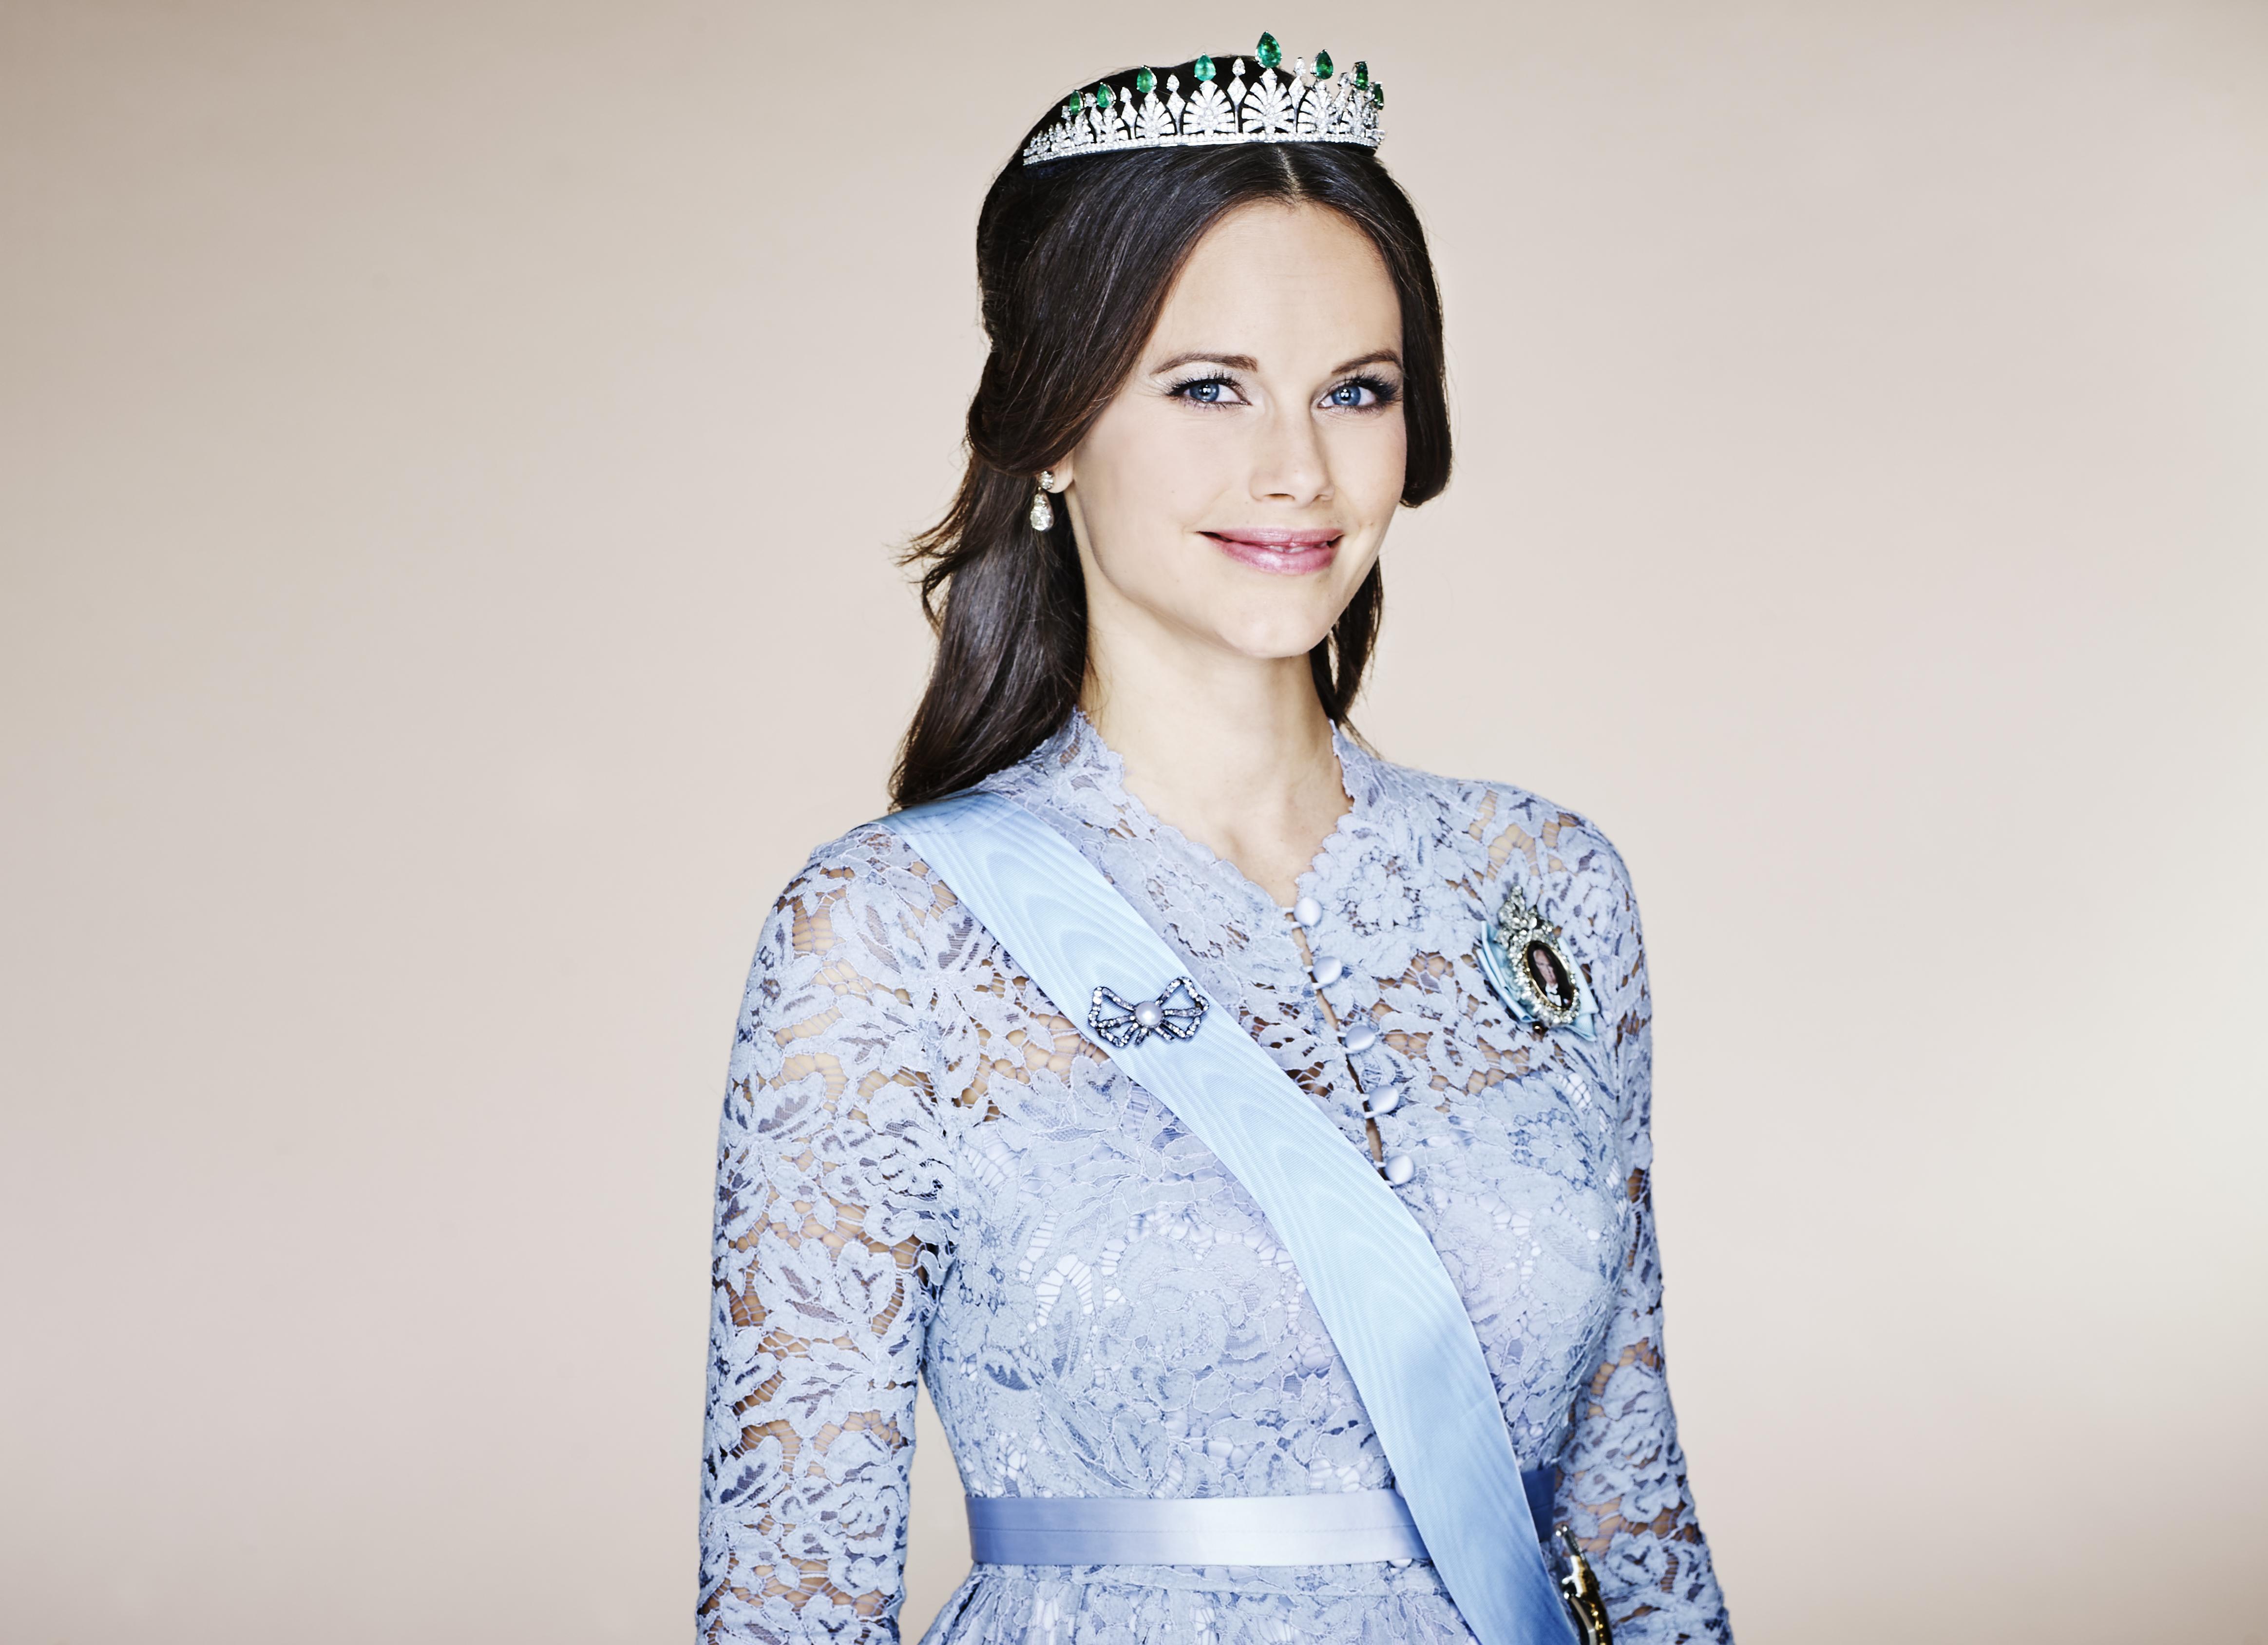 H.K.H. Prinsessan Sofia / H.R.H. Princess Sofia http://www.kungahuset.se/royalcourt/royalfamily/hrhprincesssofia/biography.4.751c664a14d8a76c833abc.html